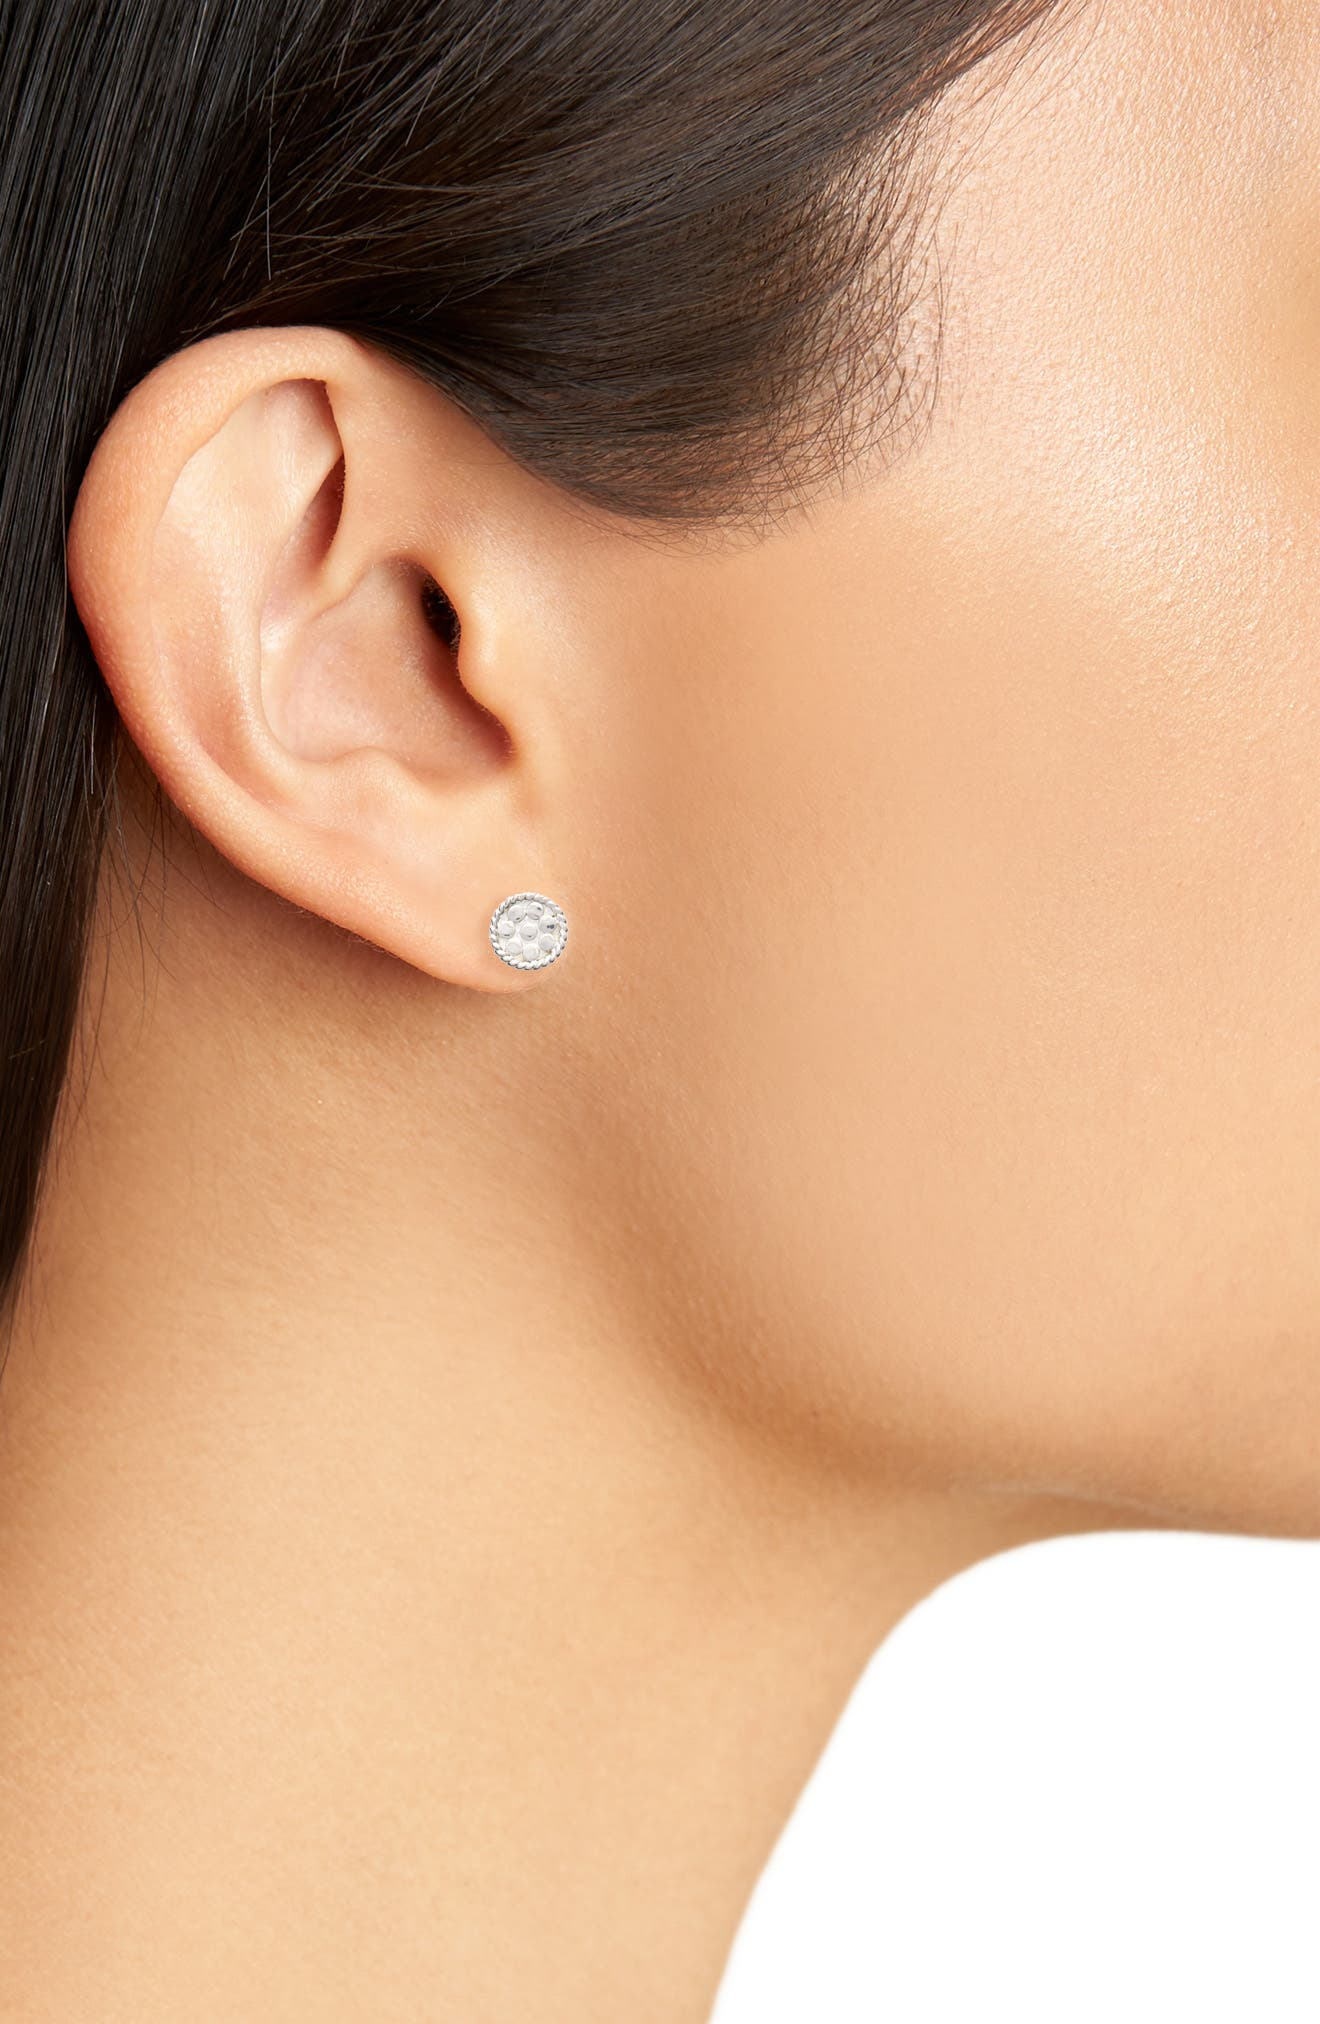 'Gili' Mini Disc Stud Earrings,                             Alternate thumbnail 2, color,                             SILVER